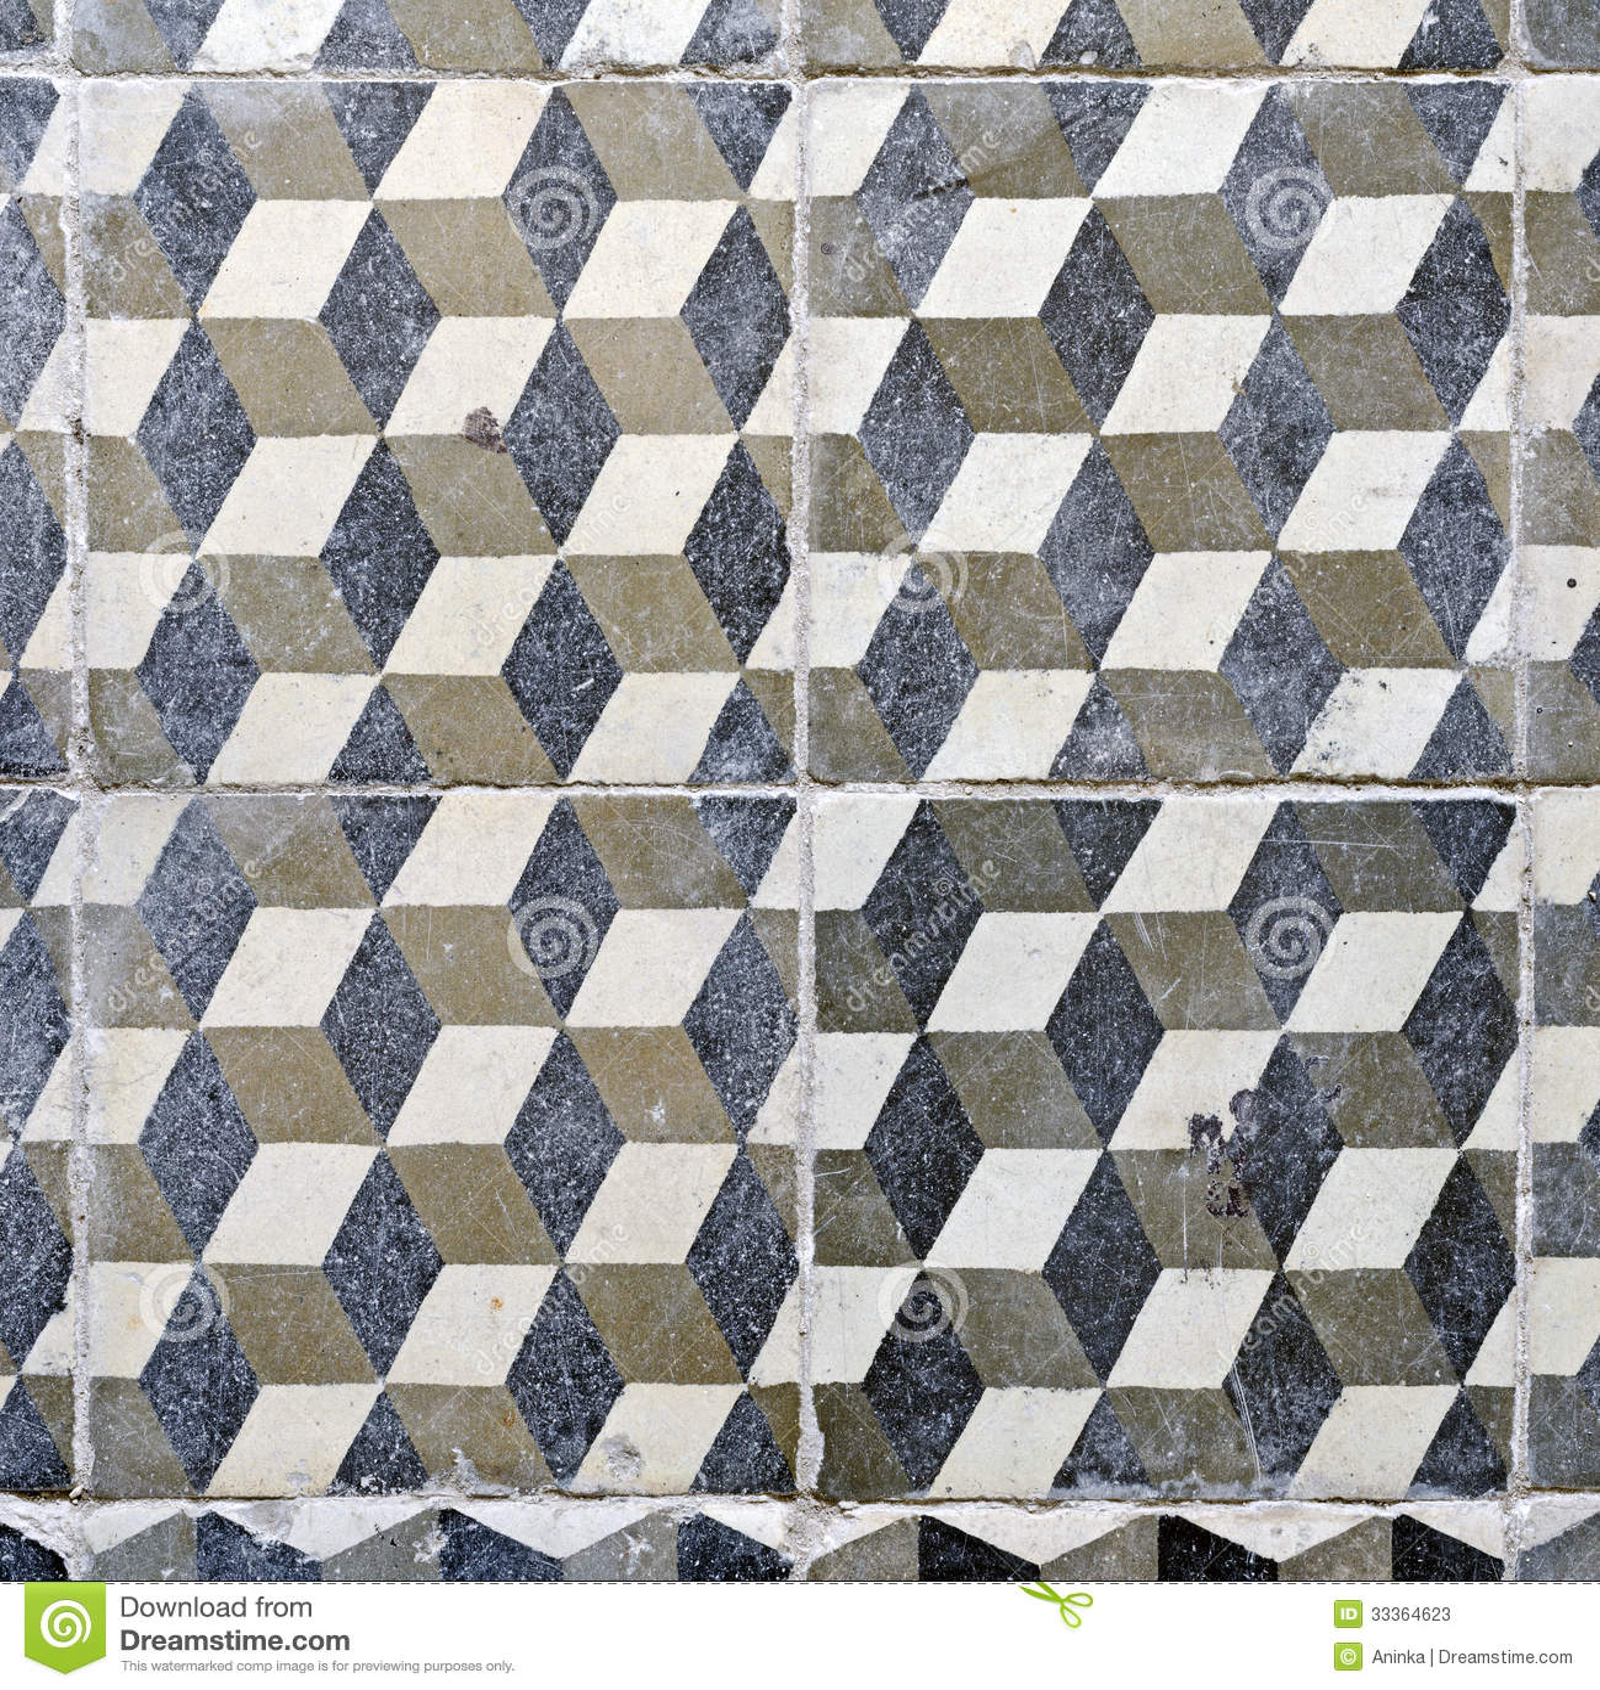 Vintage Floor Tiles Stock Photos Image 33364623